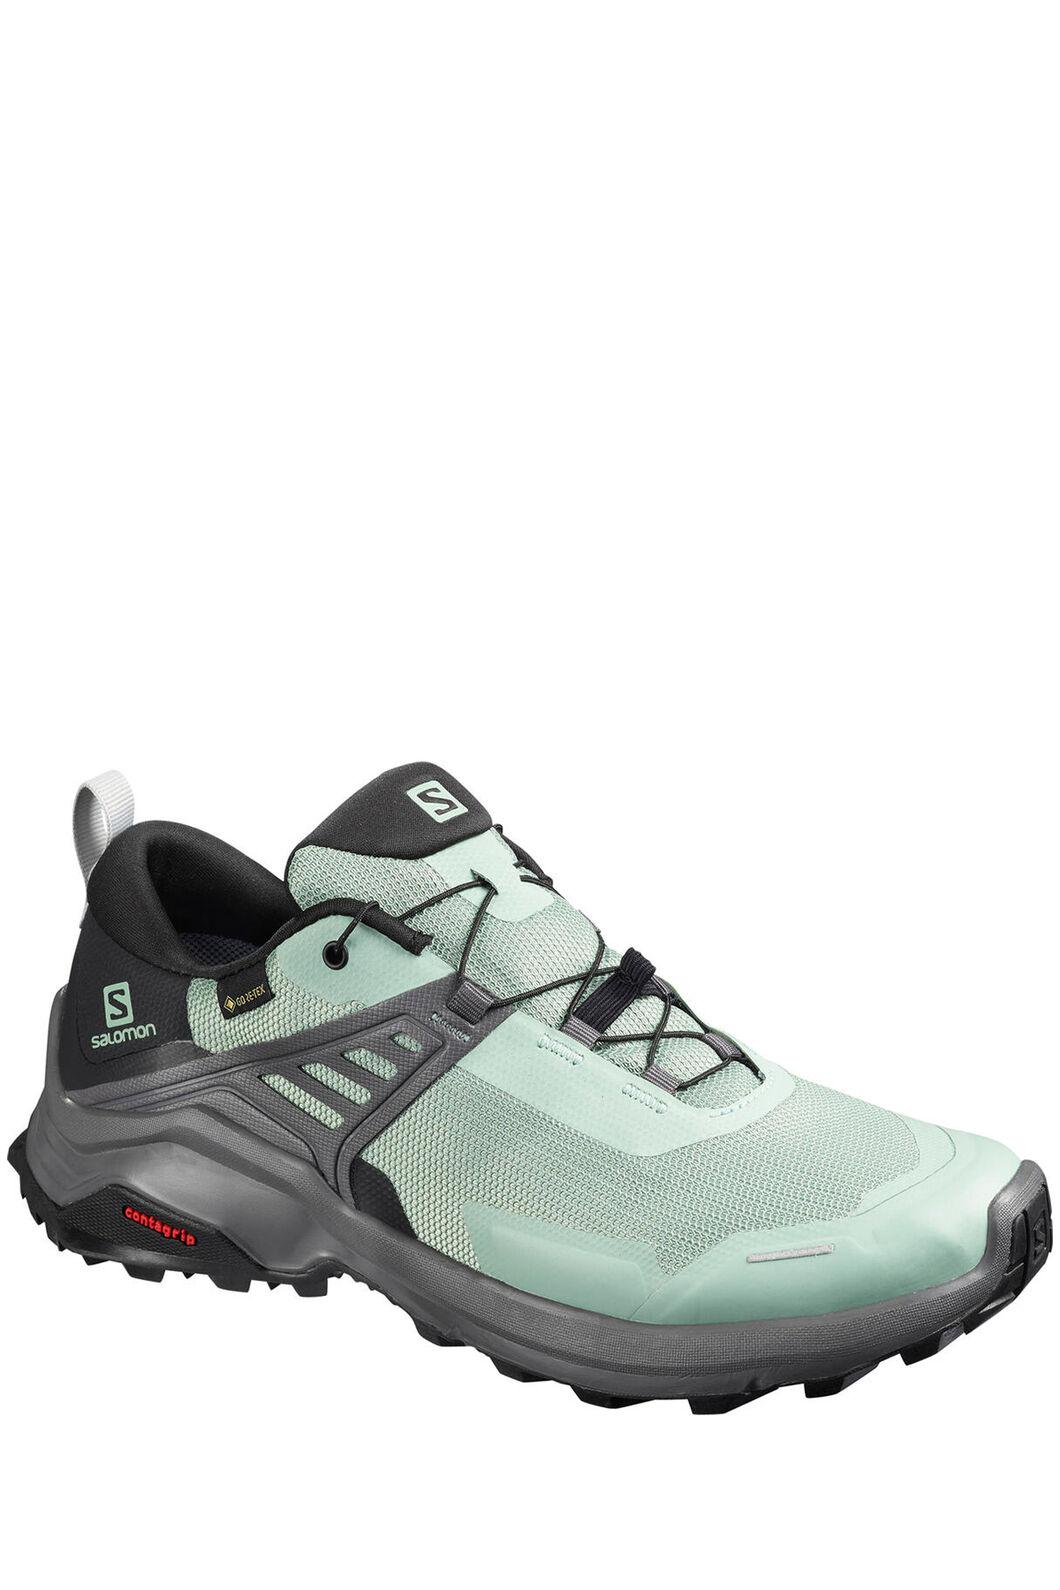 Salomon X Raise GTX Hiking Shoes — Women's, Green/Black/Magnet, hi-res